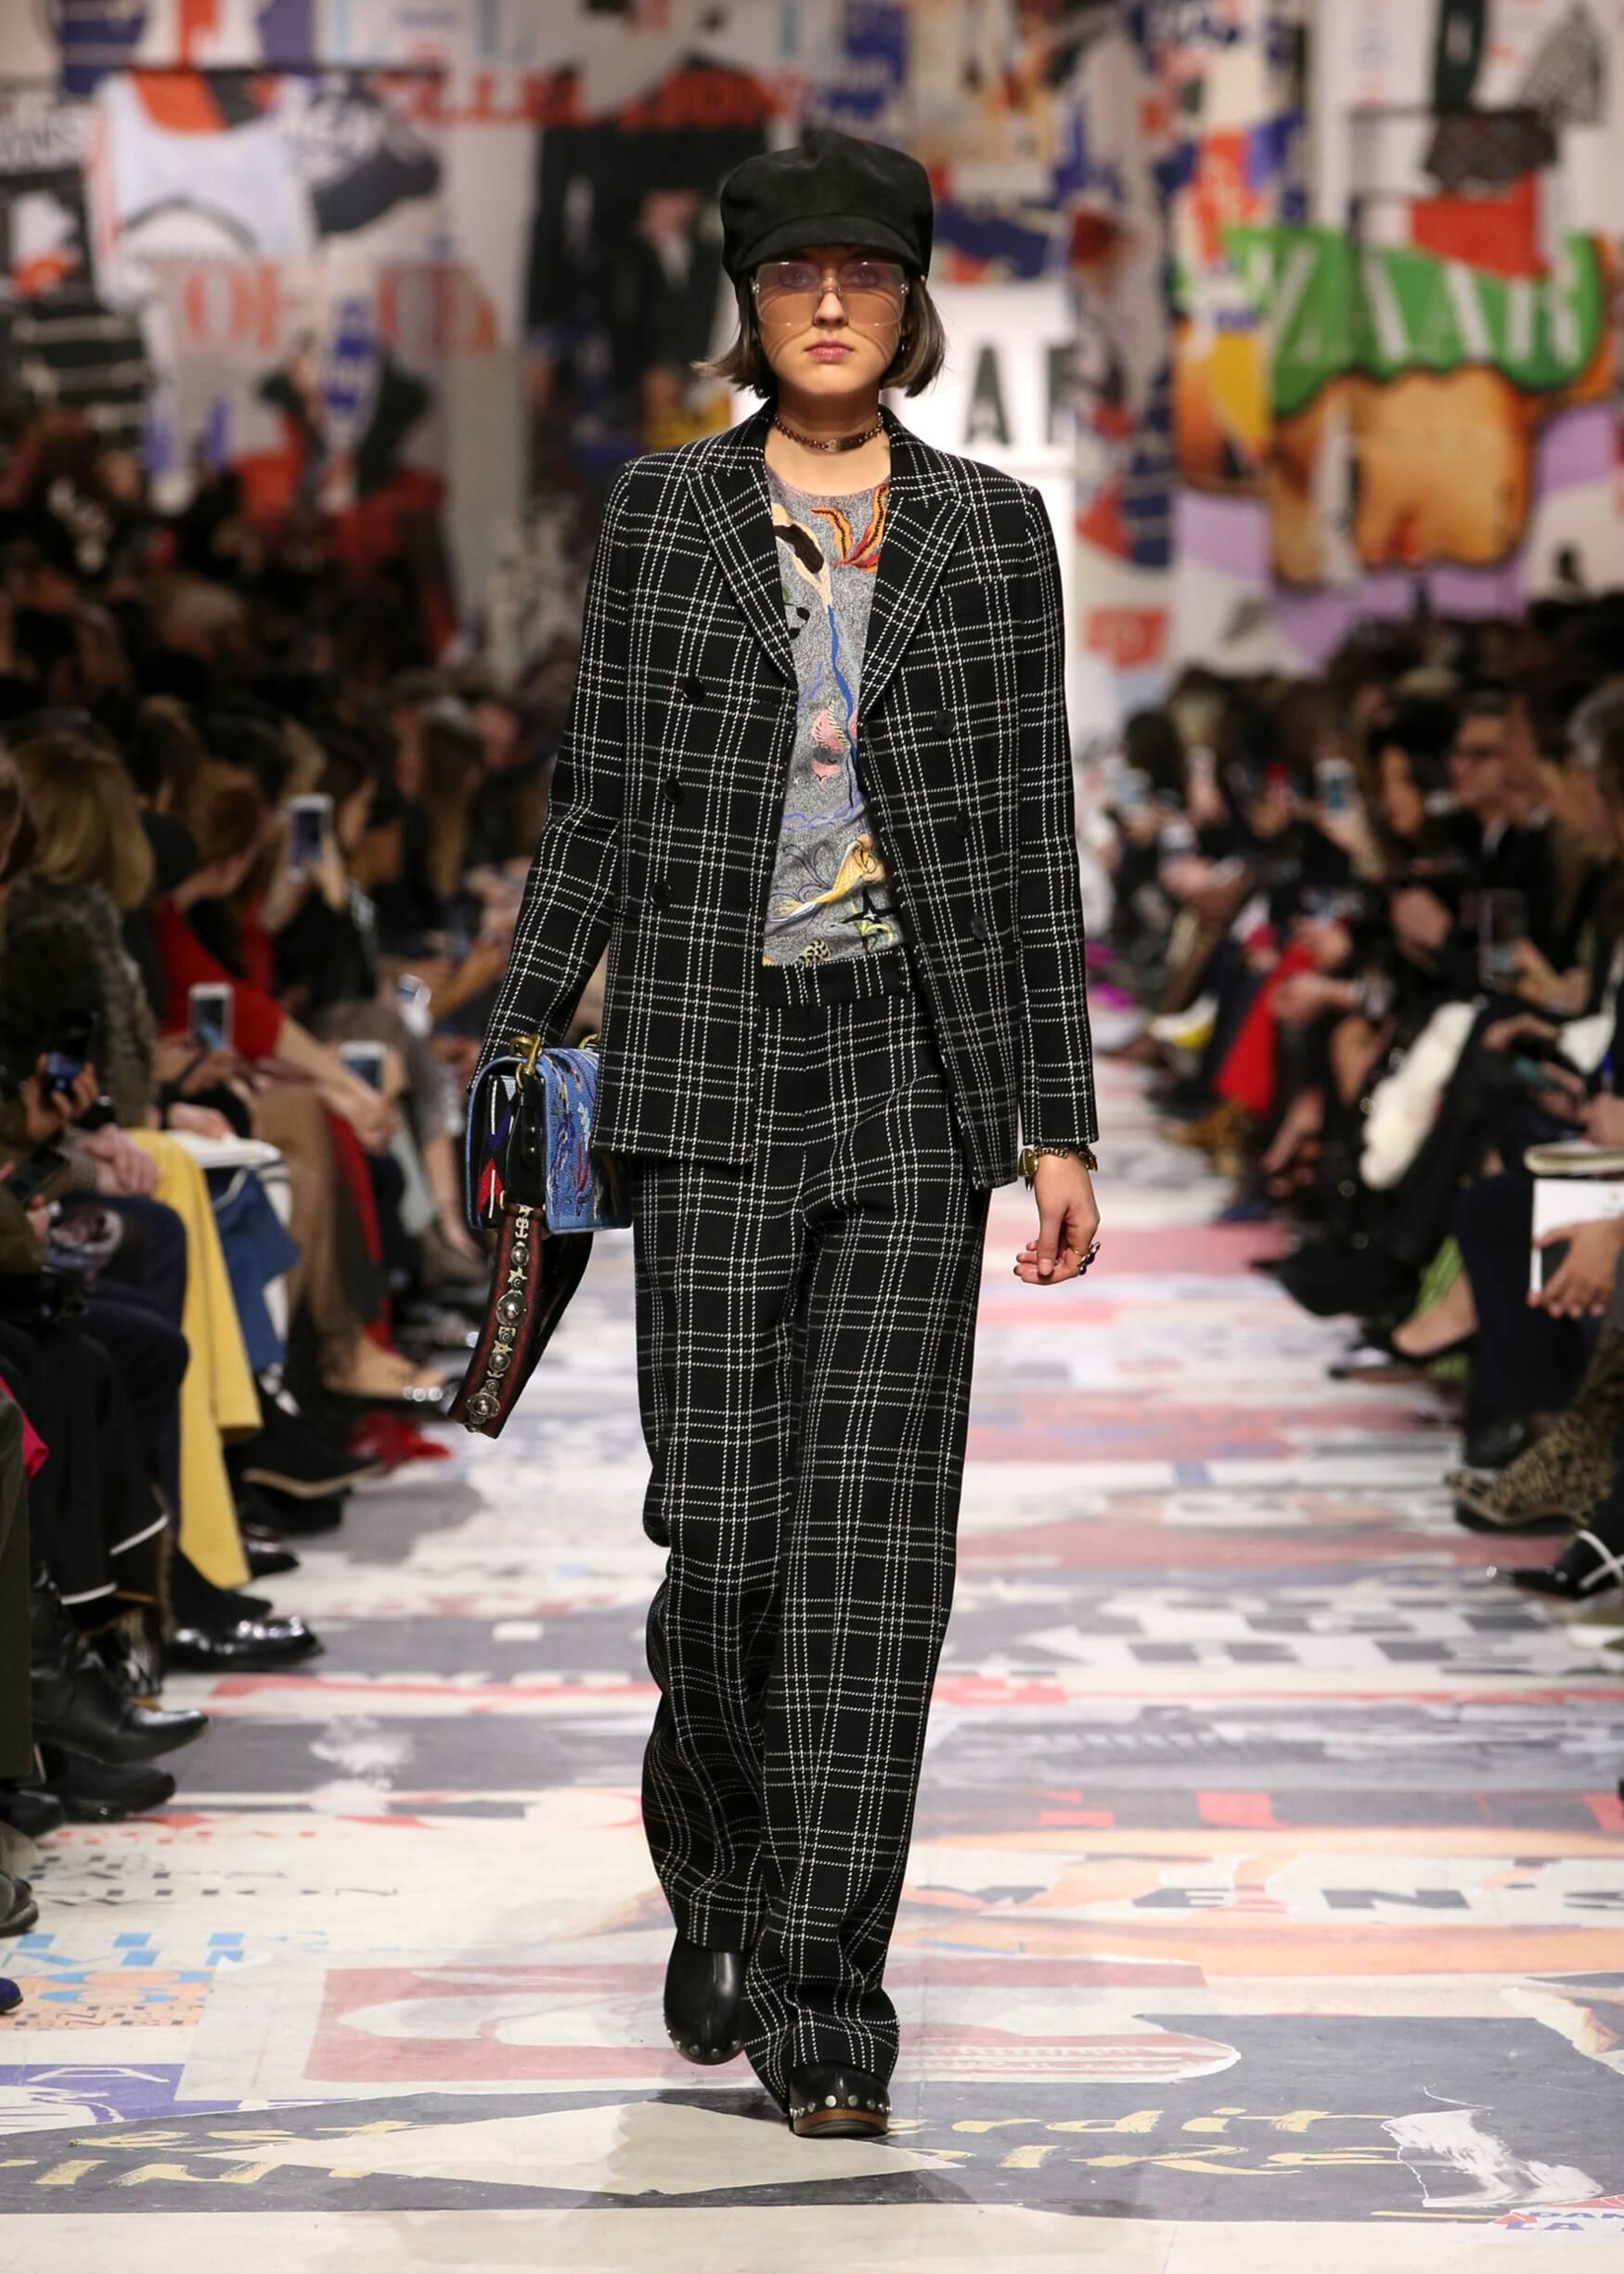 Woman Fall 2018 Fashion Trends Dior